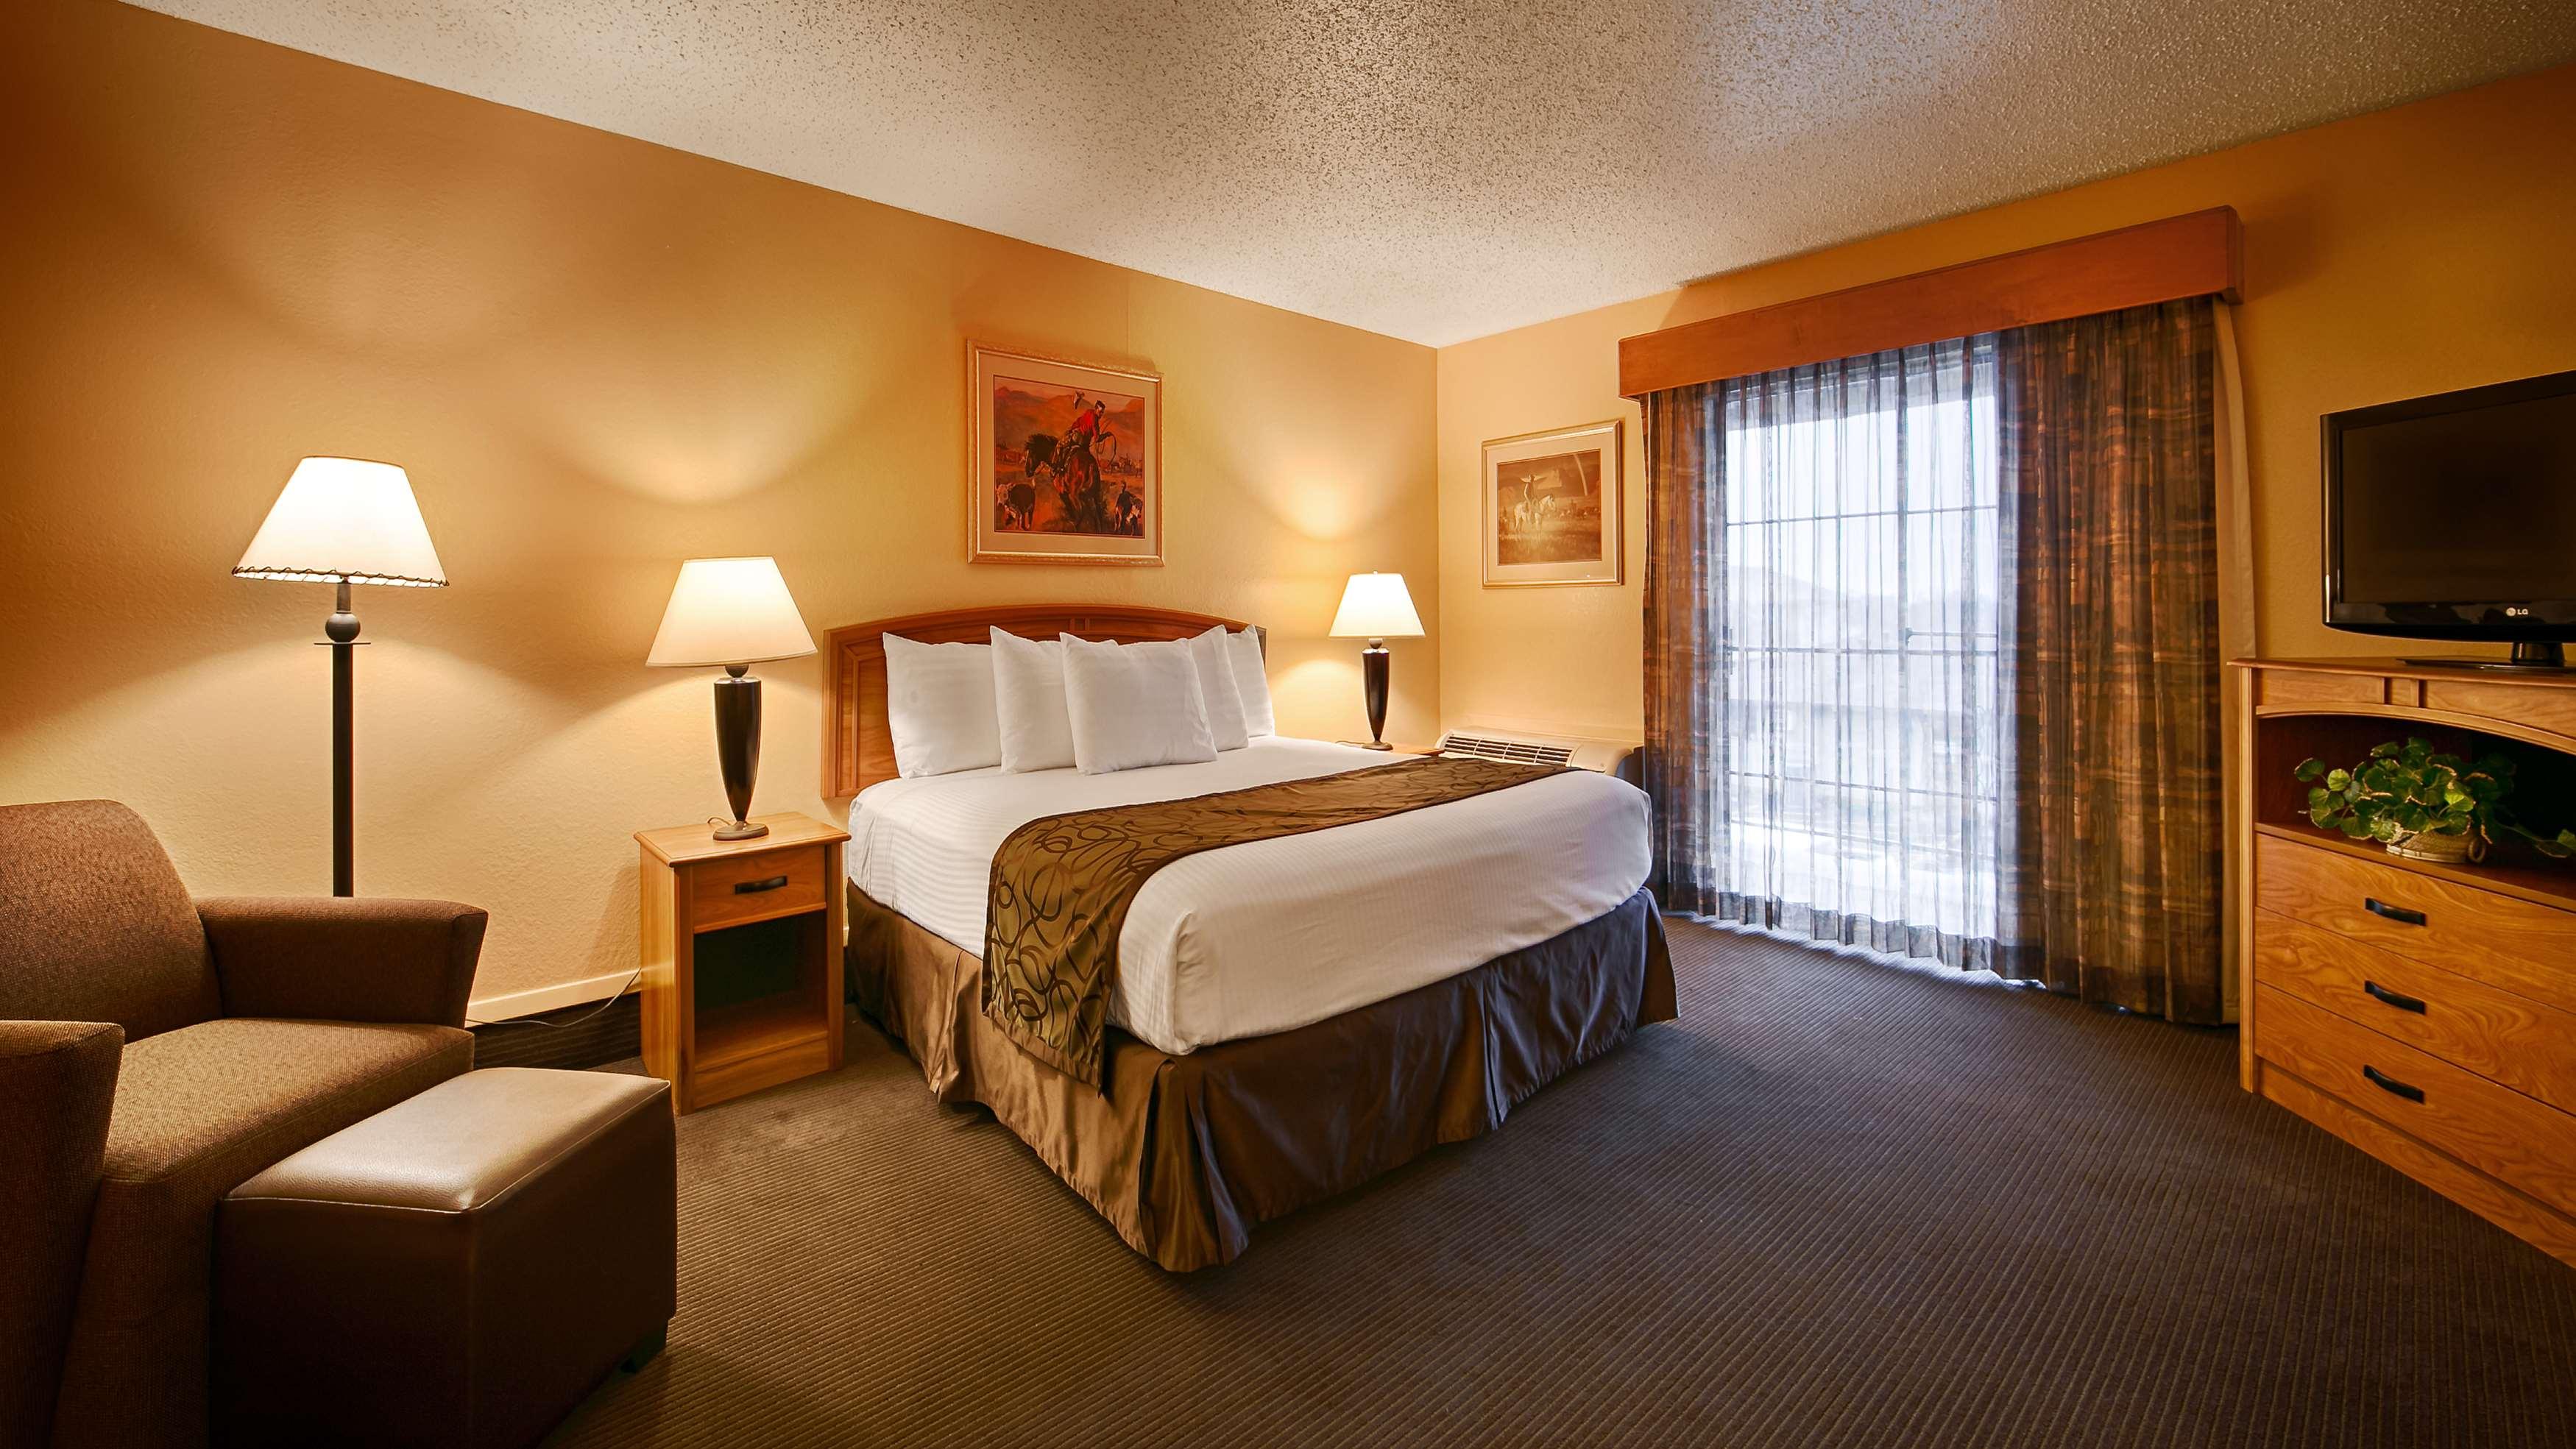 Best Western Trail Dust Inn & Suites image 21